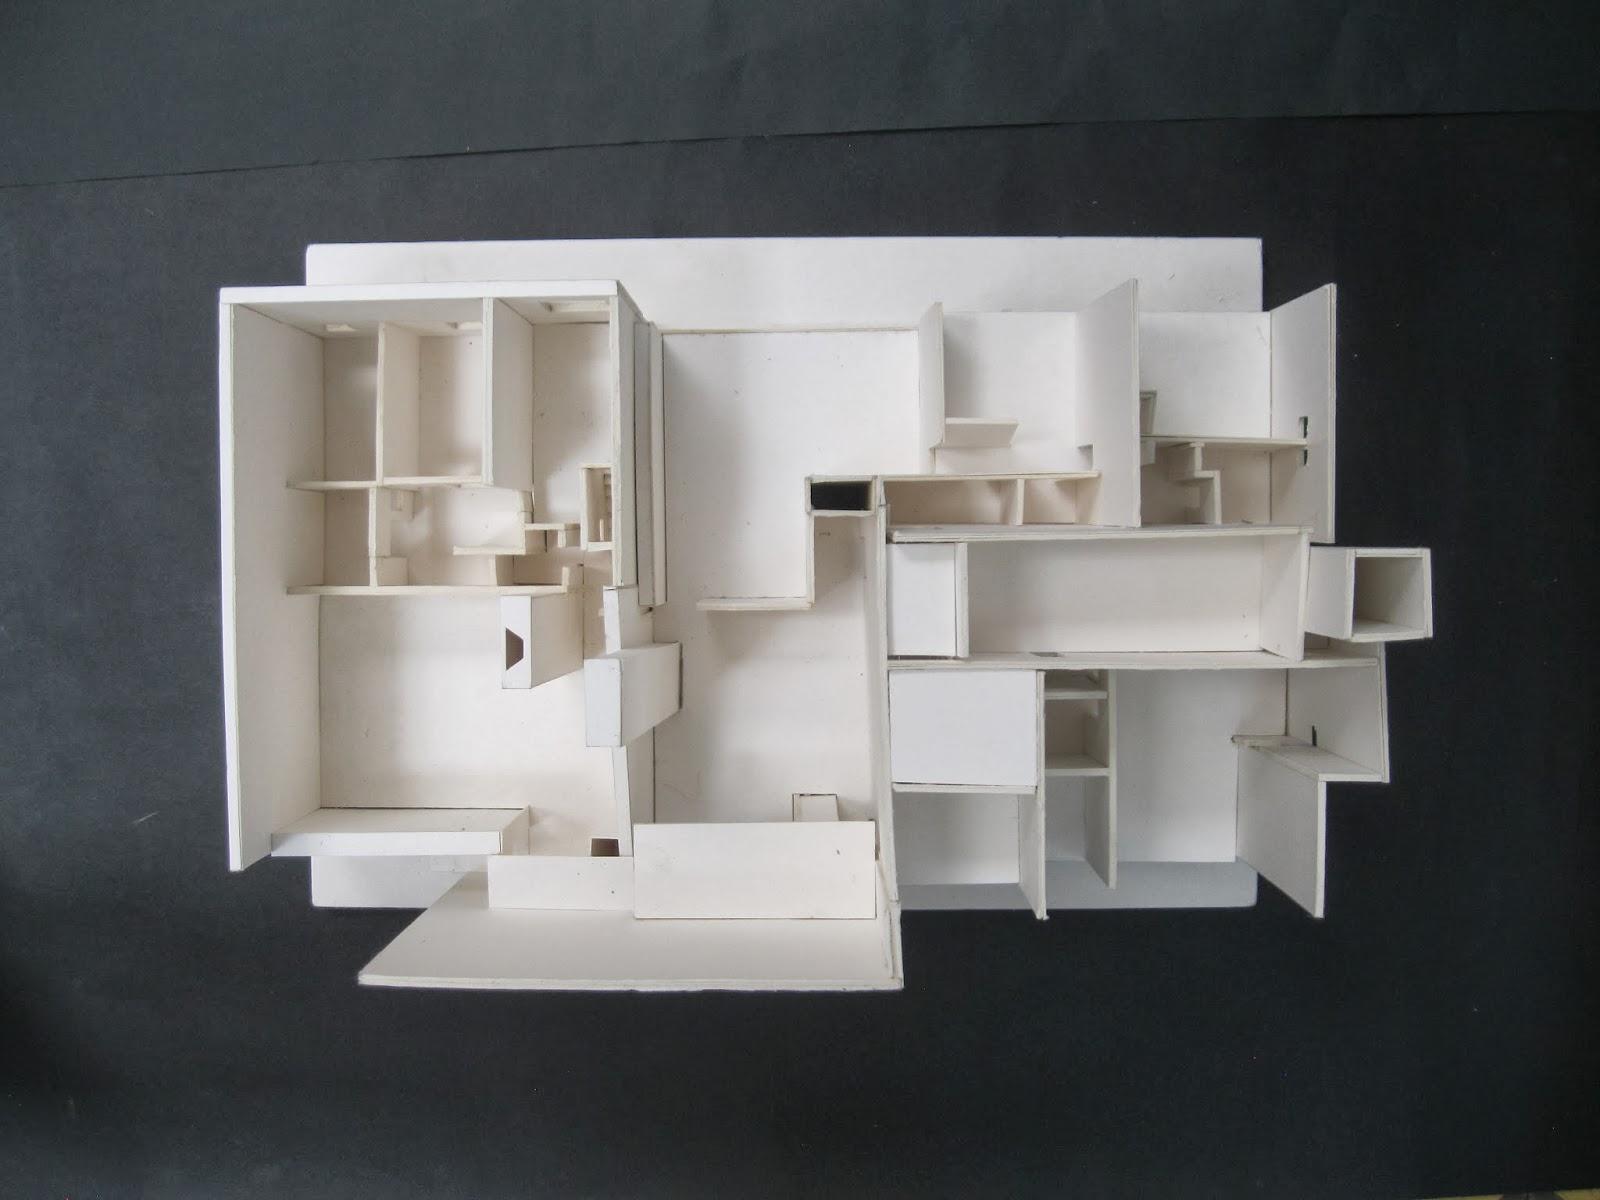 Historia De La Arquitectura Moderna Casa Estudio En